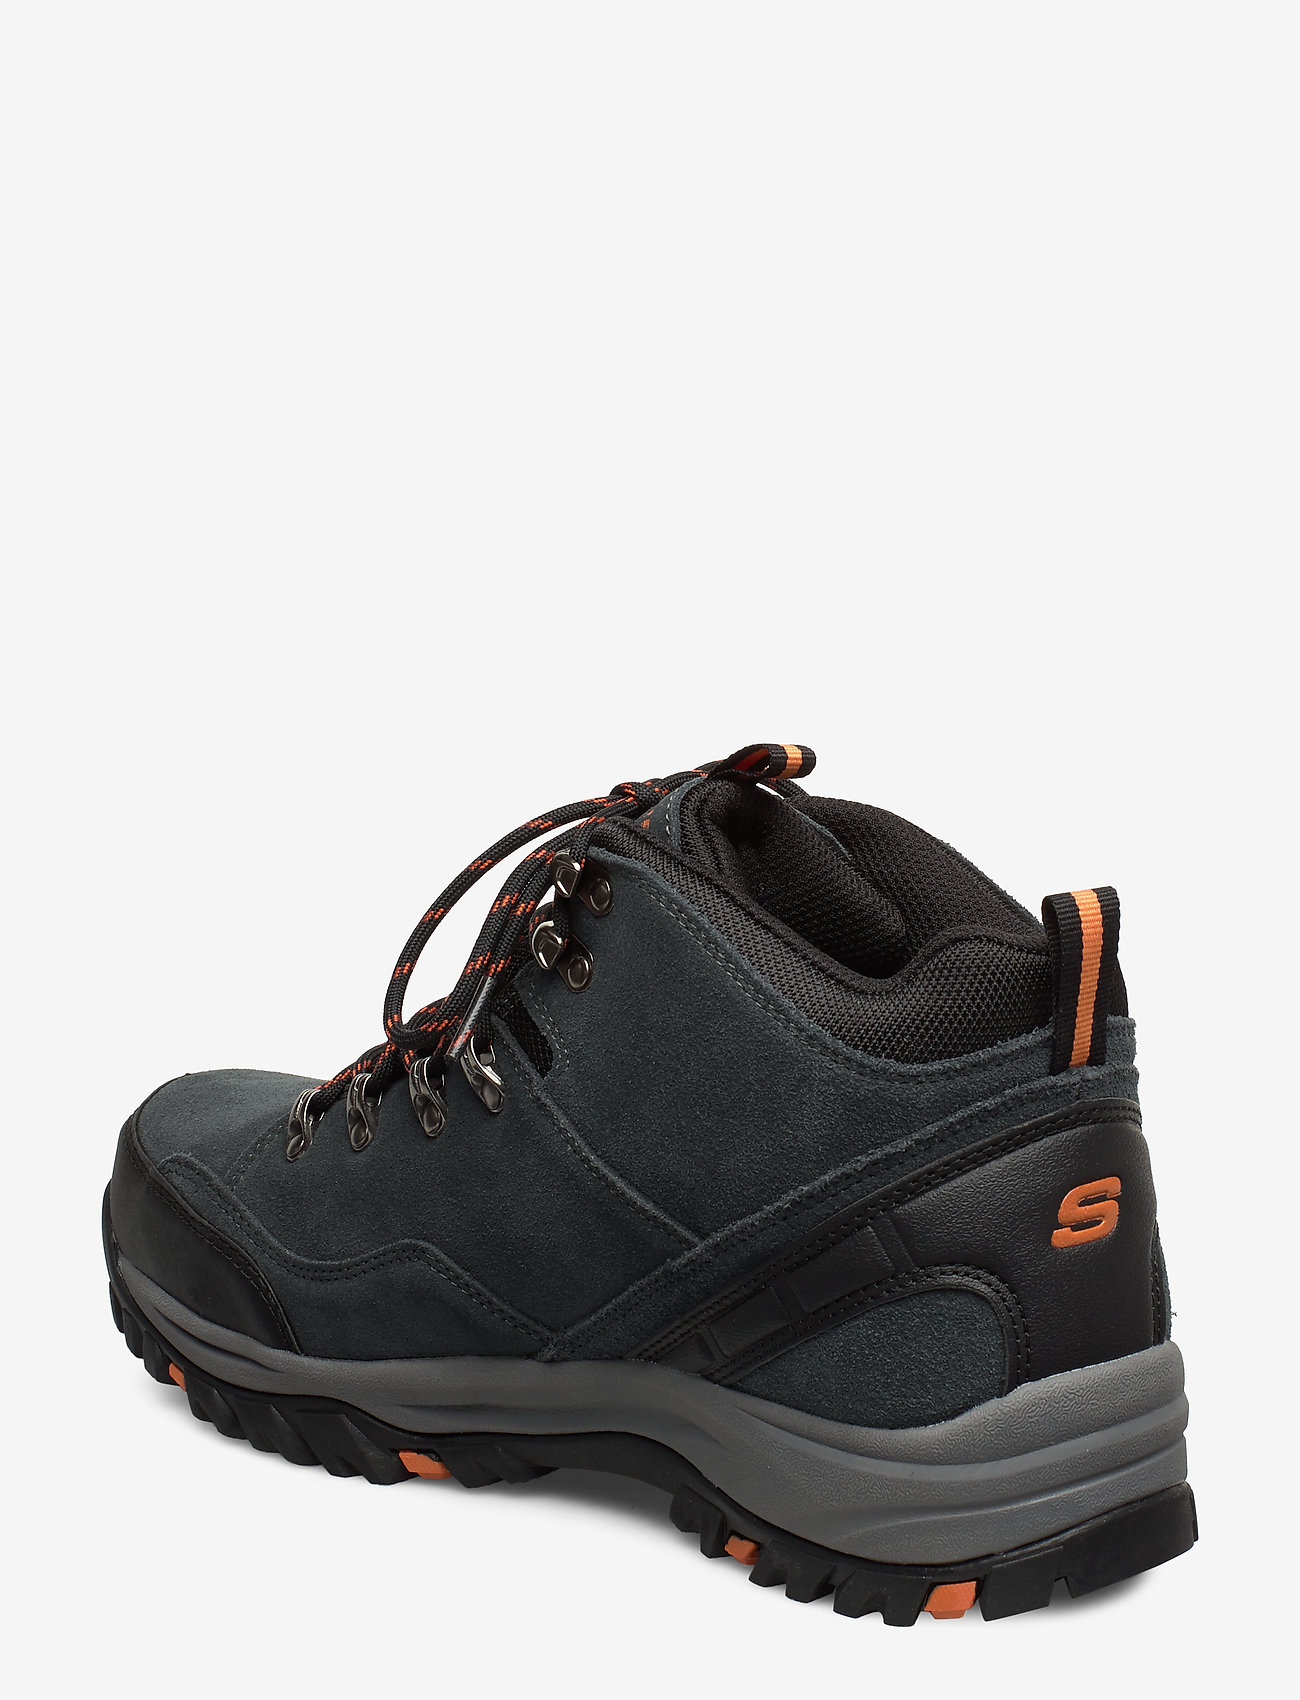 Mens Relment - Pelmo - Waterproof (Gry Grey) - Skechers